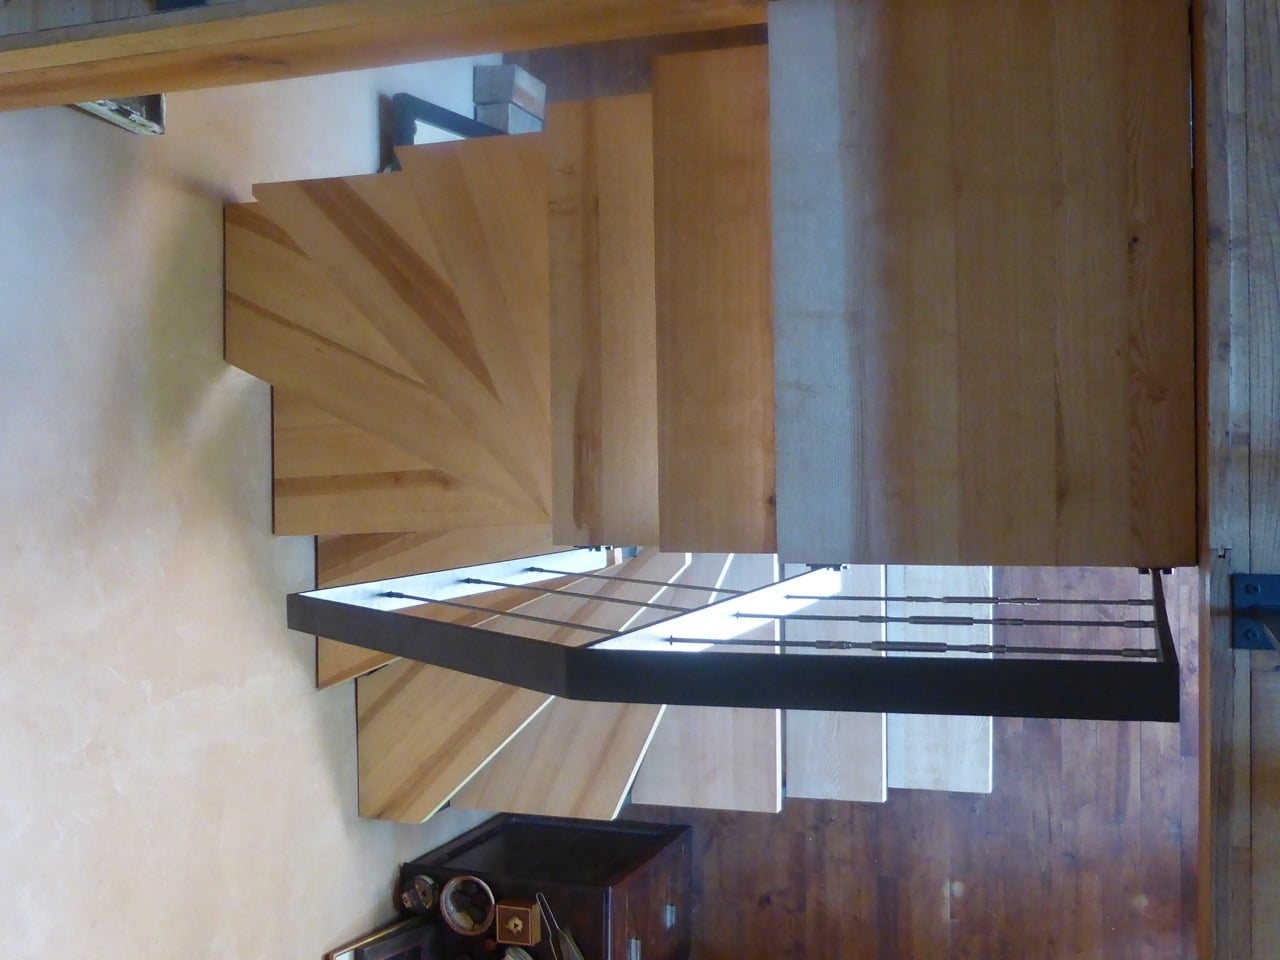 escalier colimacon3 escalier jacoby. Black Bedroom Furniture Sets. Home Design Ideas